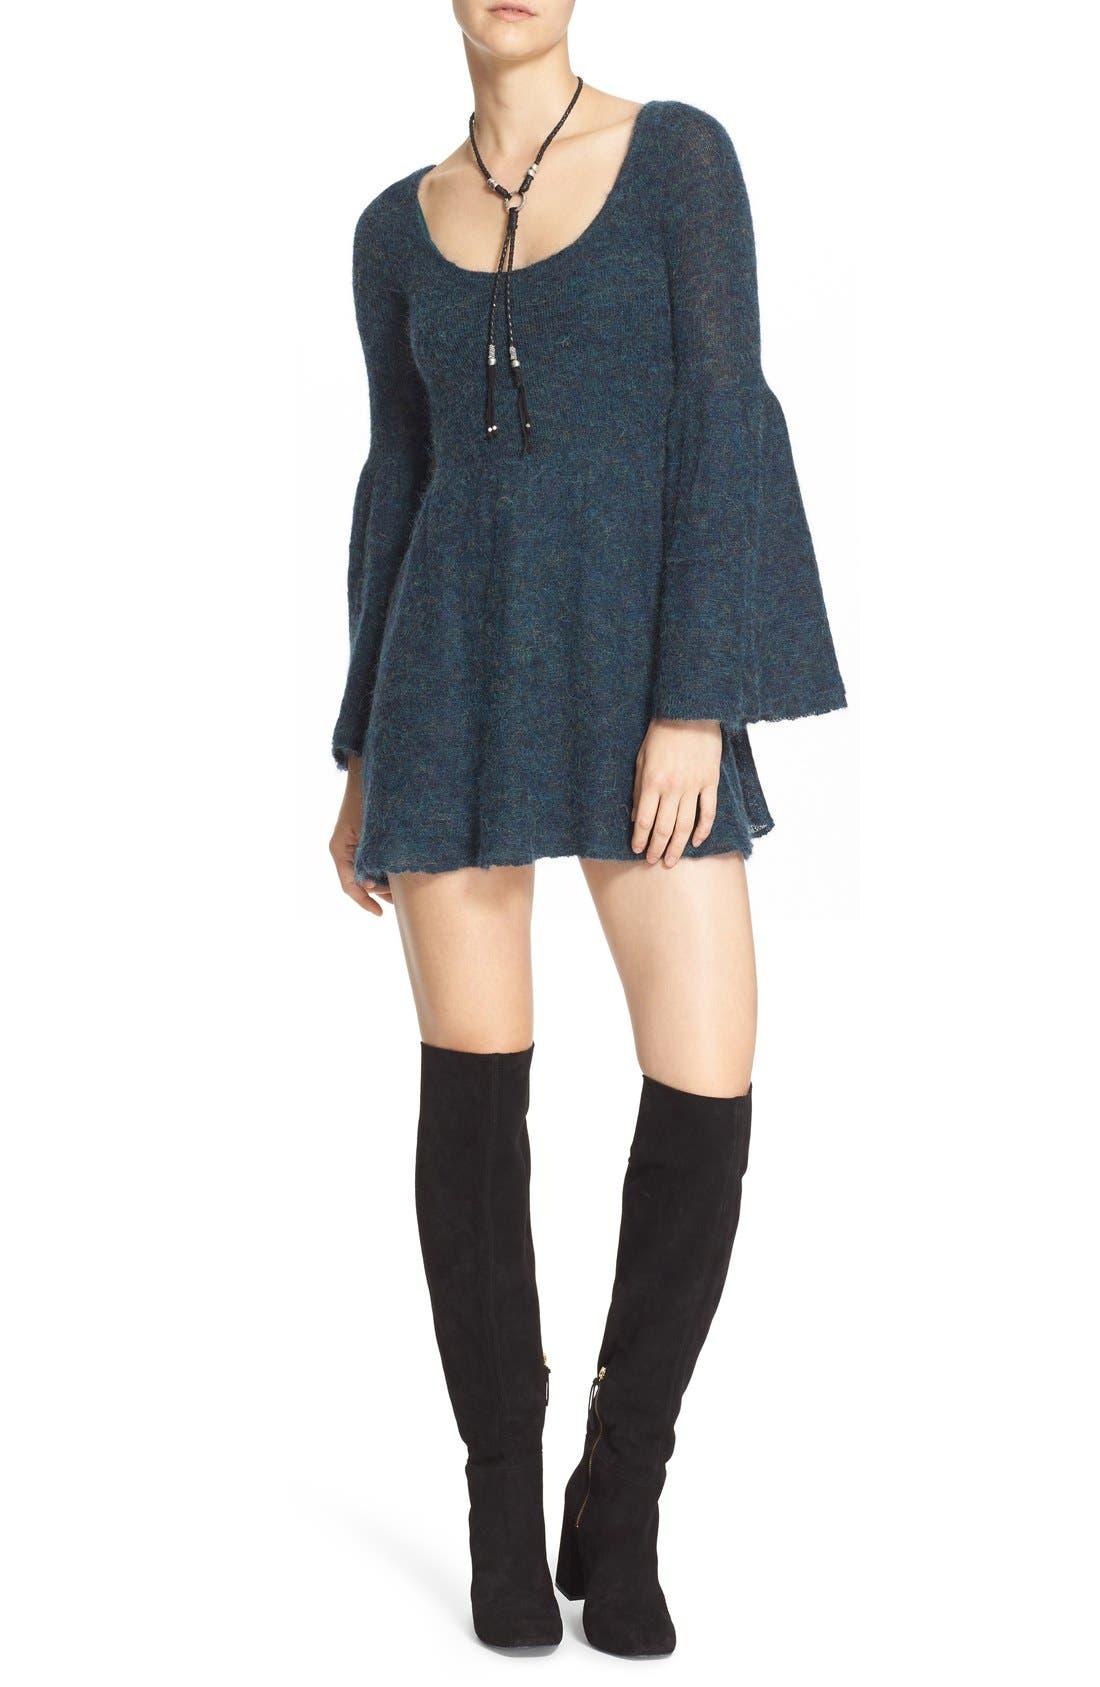 Alternate Image 1 Selected - Free People 'Juliet' Babydoll Sweater Dress